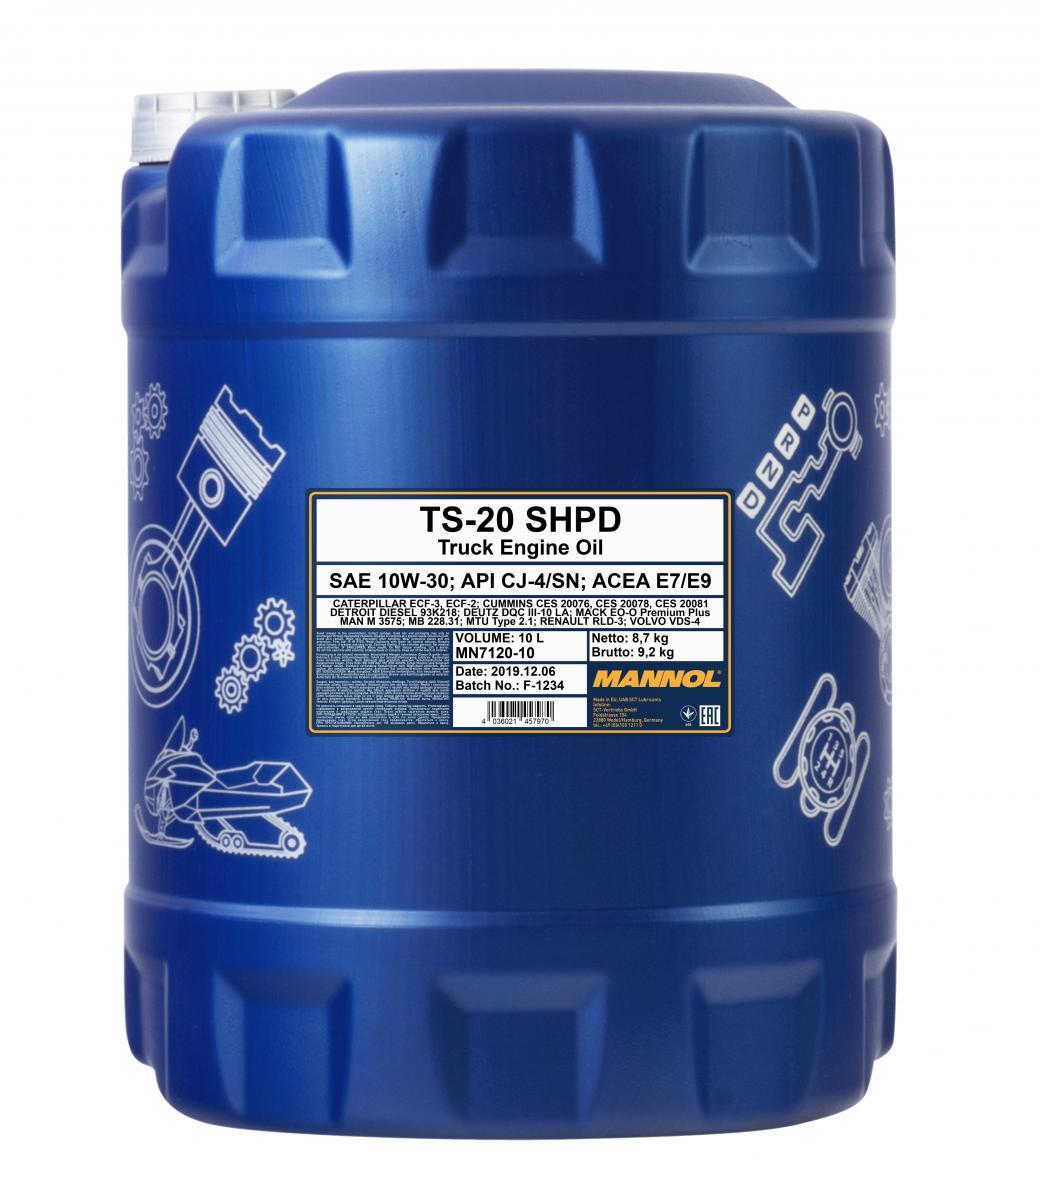 MN7120-10 MANNOL TS-20, SHPD 10W-30, 10W-30, 10l Motoröl MN7120-10 günstig kaufen